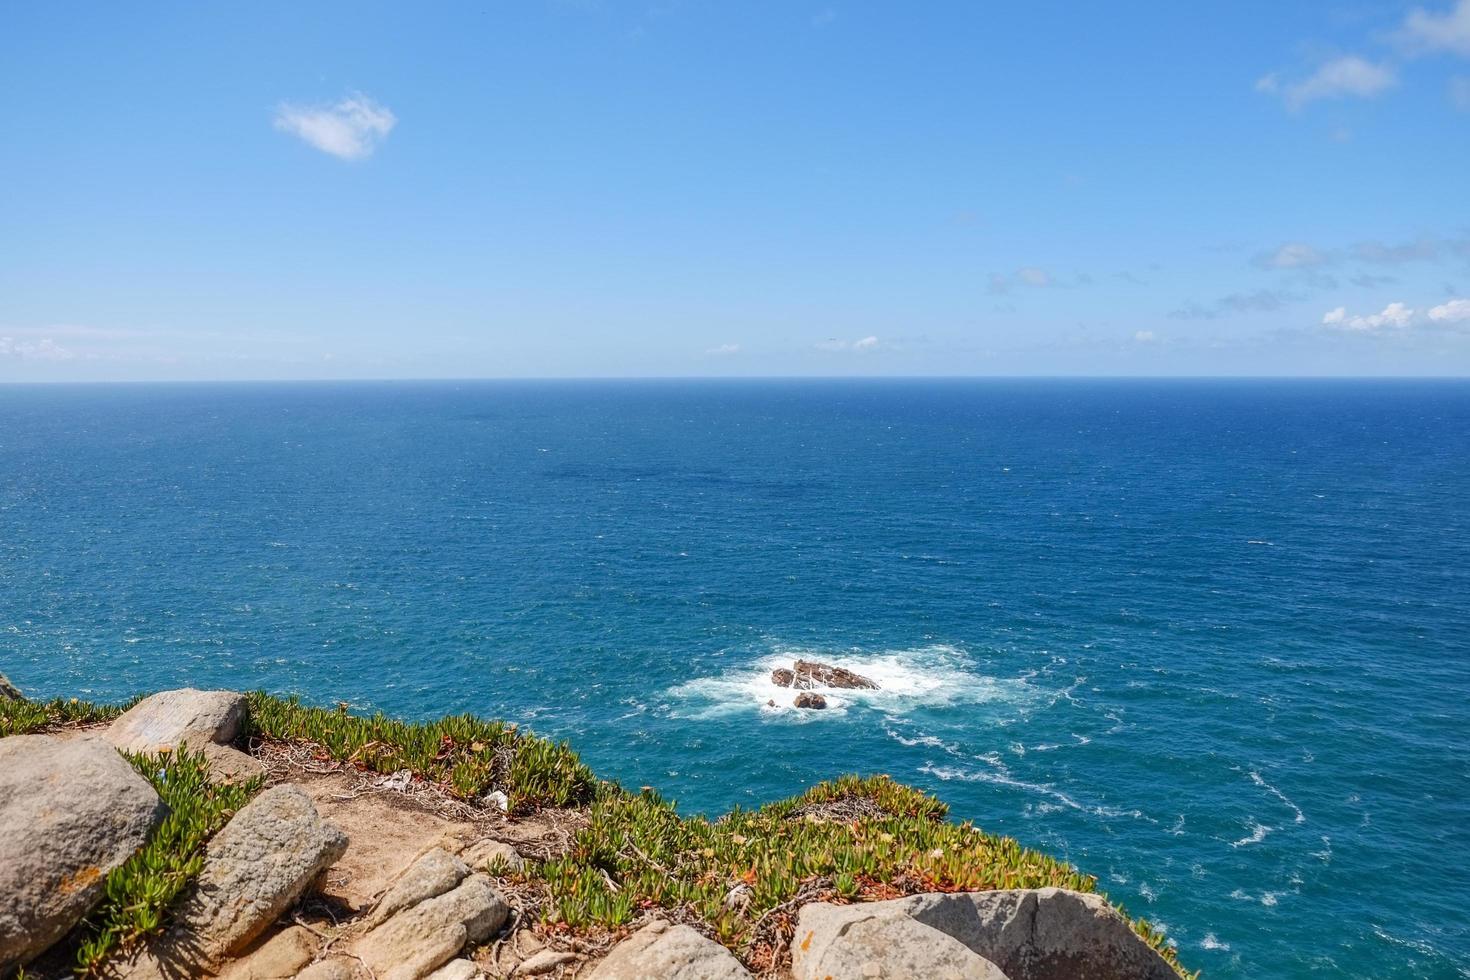 océan atlantique avec de petites vagues contre le ciel bleu photo